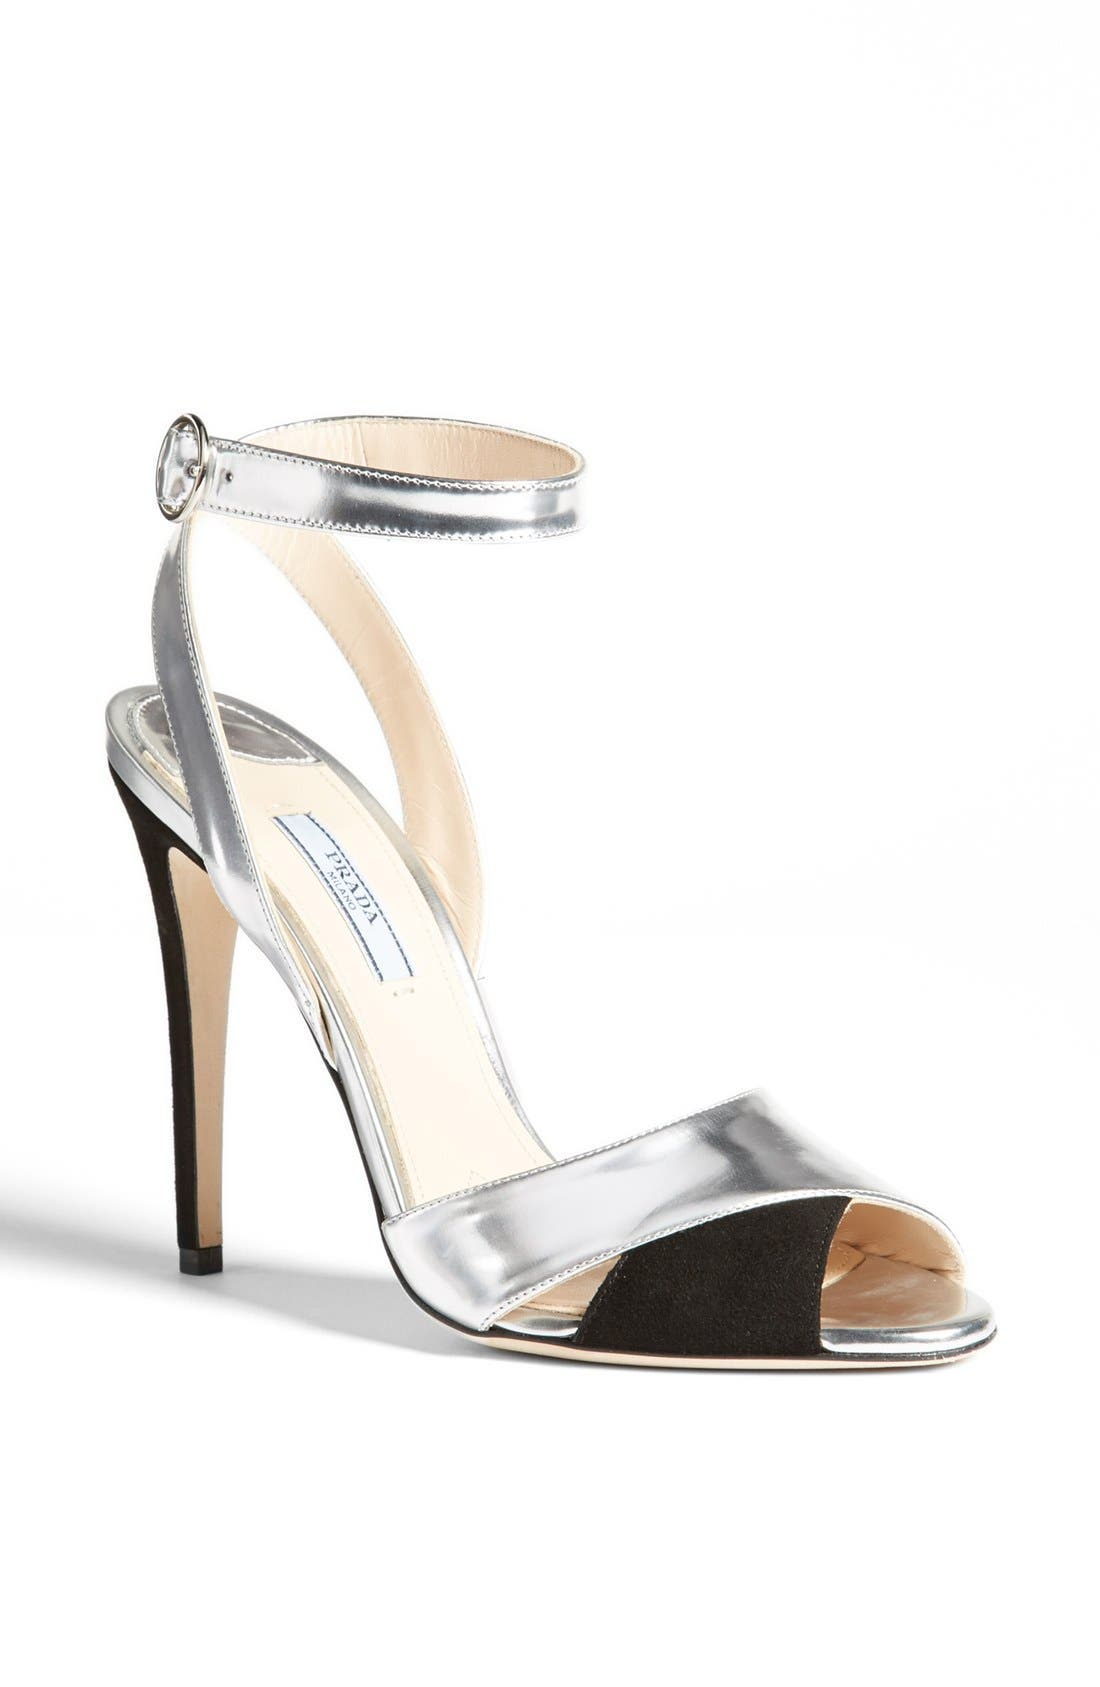 Main Image - Prada Bicolor Metallic Ankle Strap Sandal